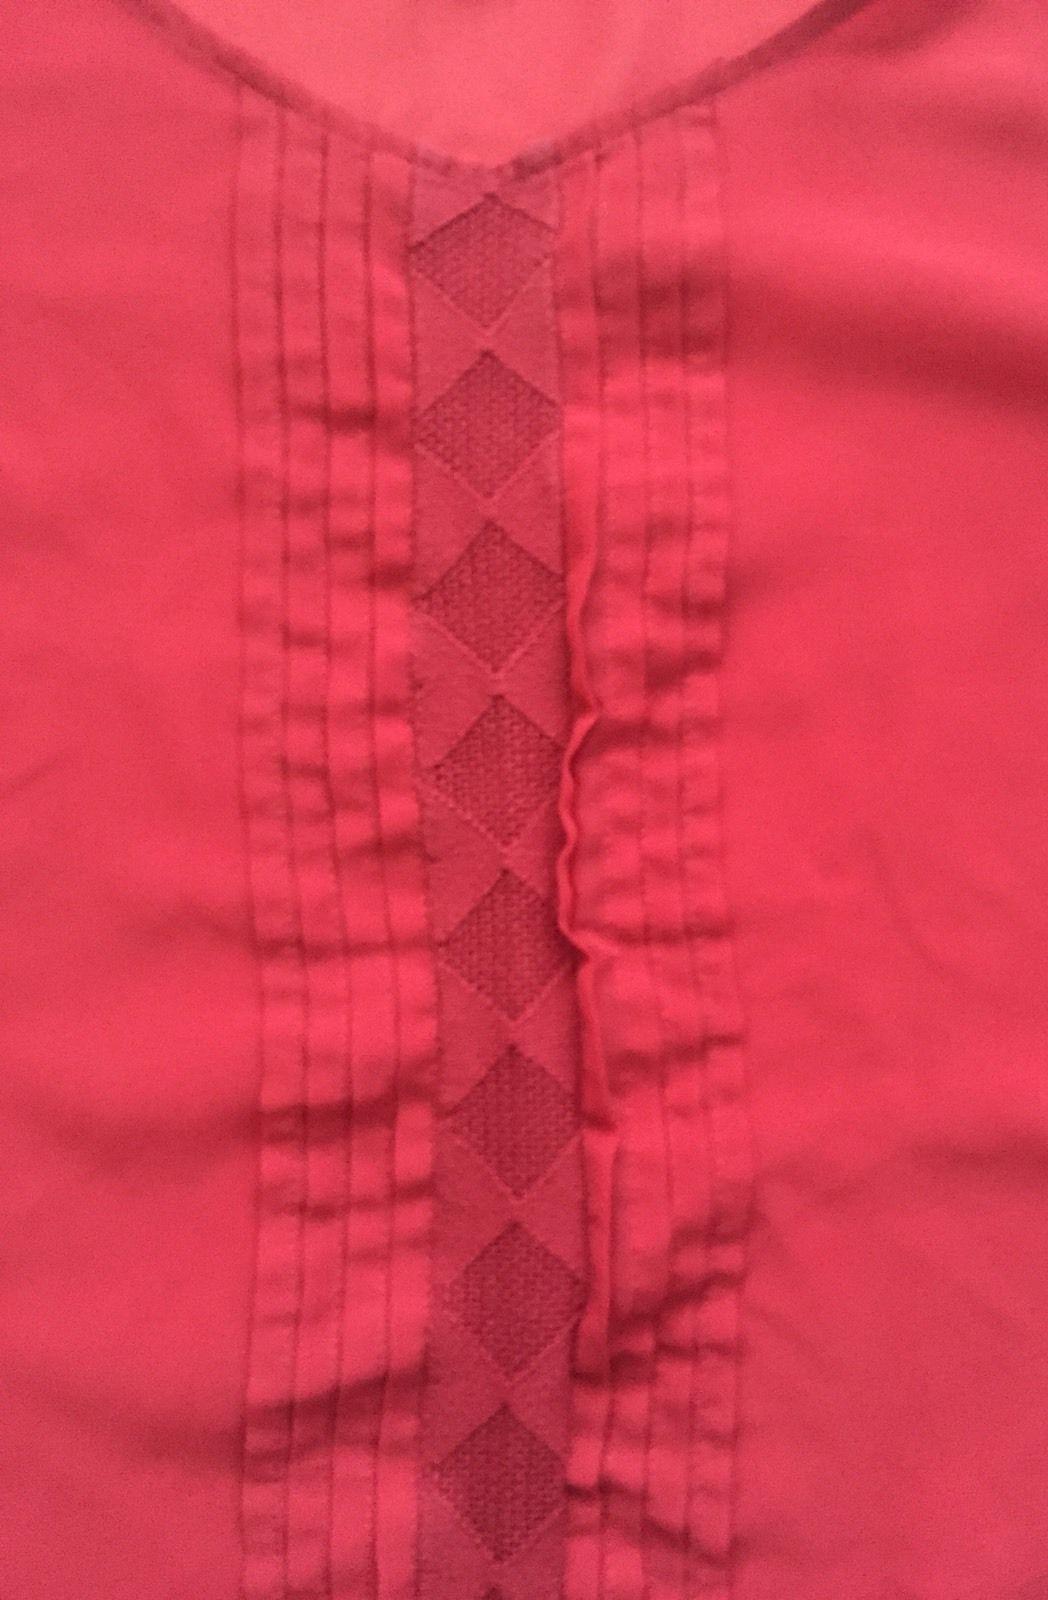 Loft Dark Pink Sheer Blouse Shirt XS Pleated Diamond Weave Gathered Shoulders